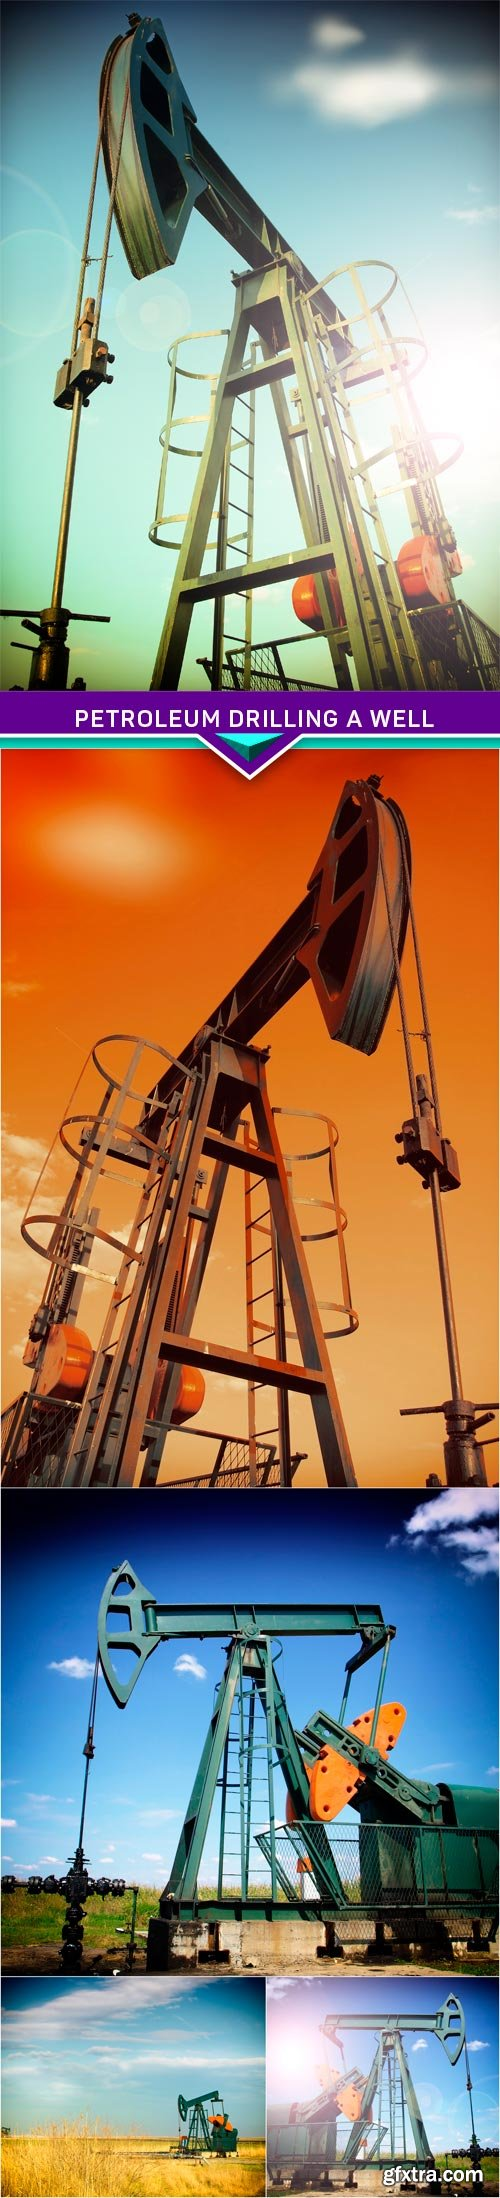 Petroleum drilling a well 5X JPEG